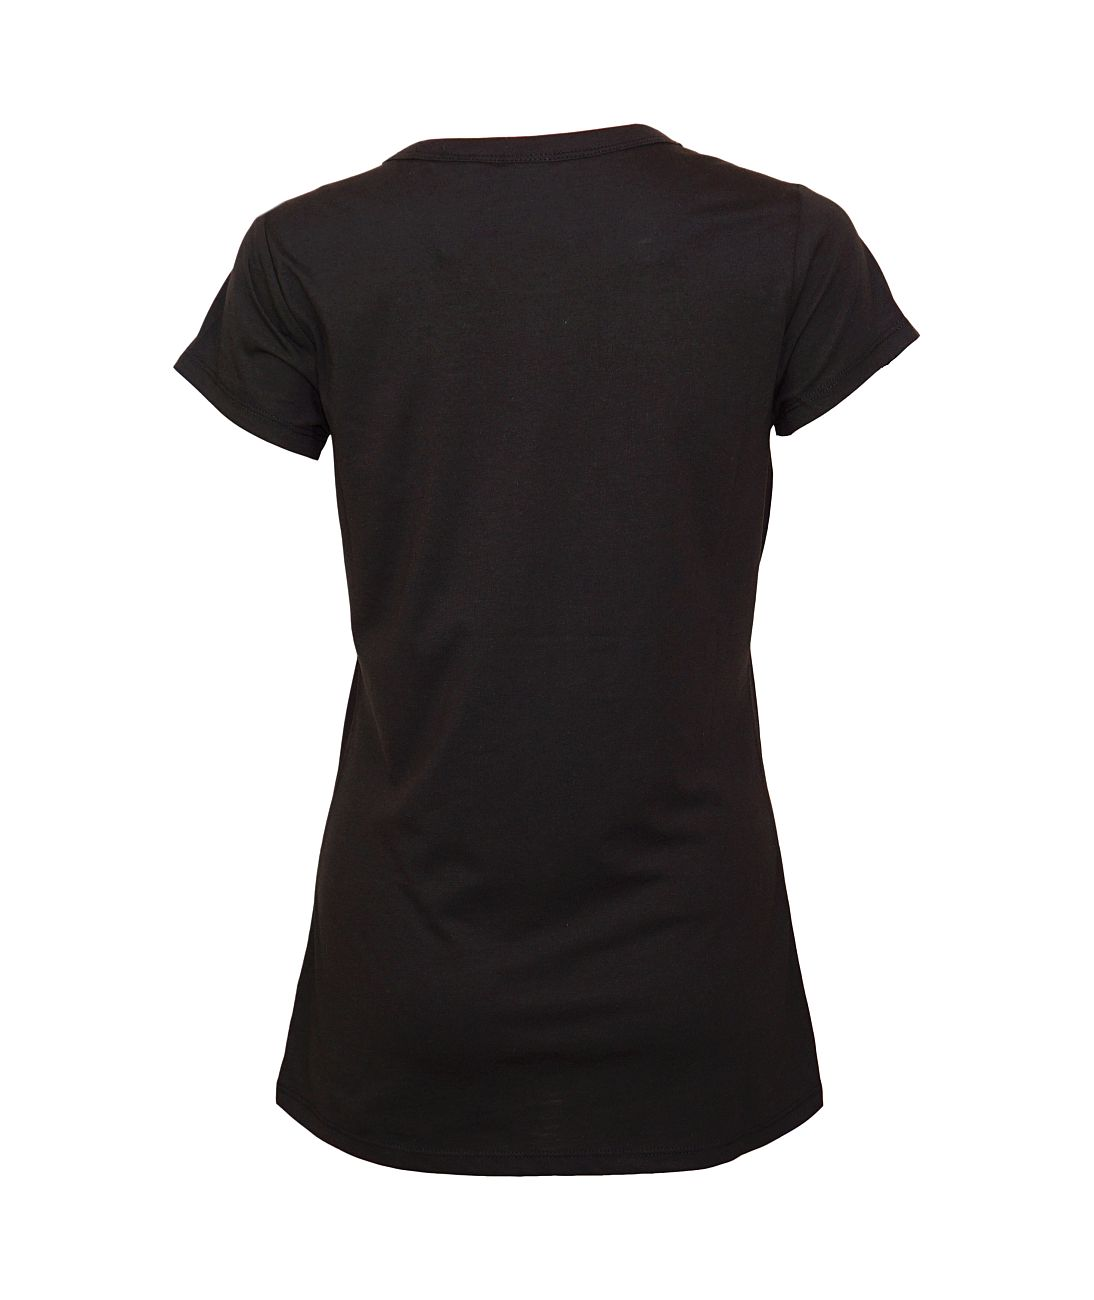 G-Star RAW Damen Shirt T-Shirt Eyben slim D04432 2757 990 Black F18-GSD1